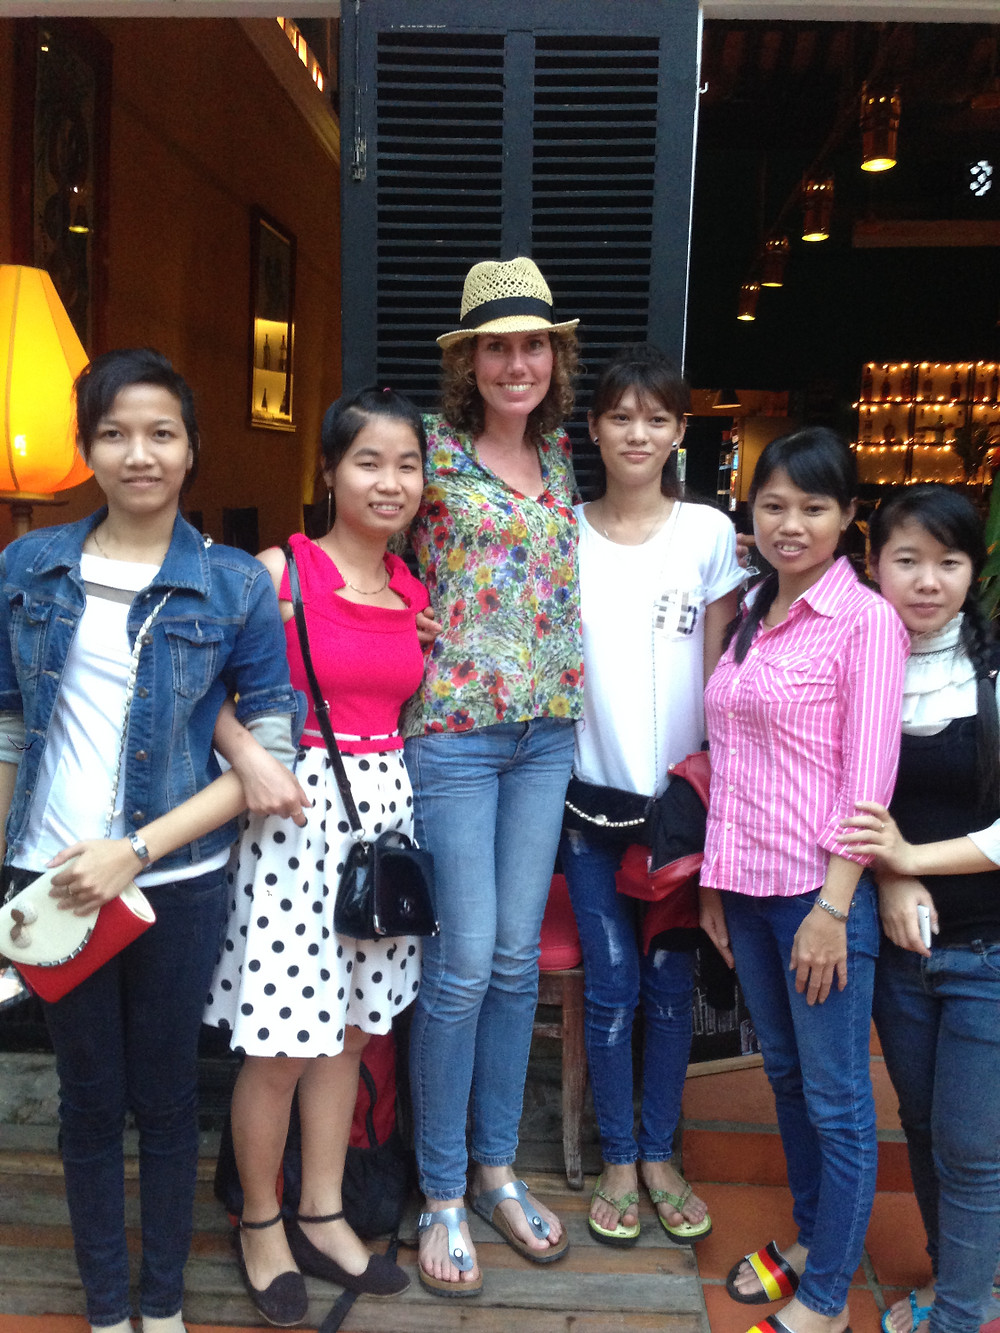 Lonnies Planet in Vietnam